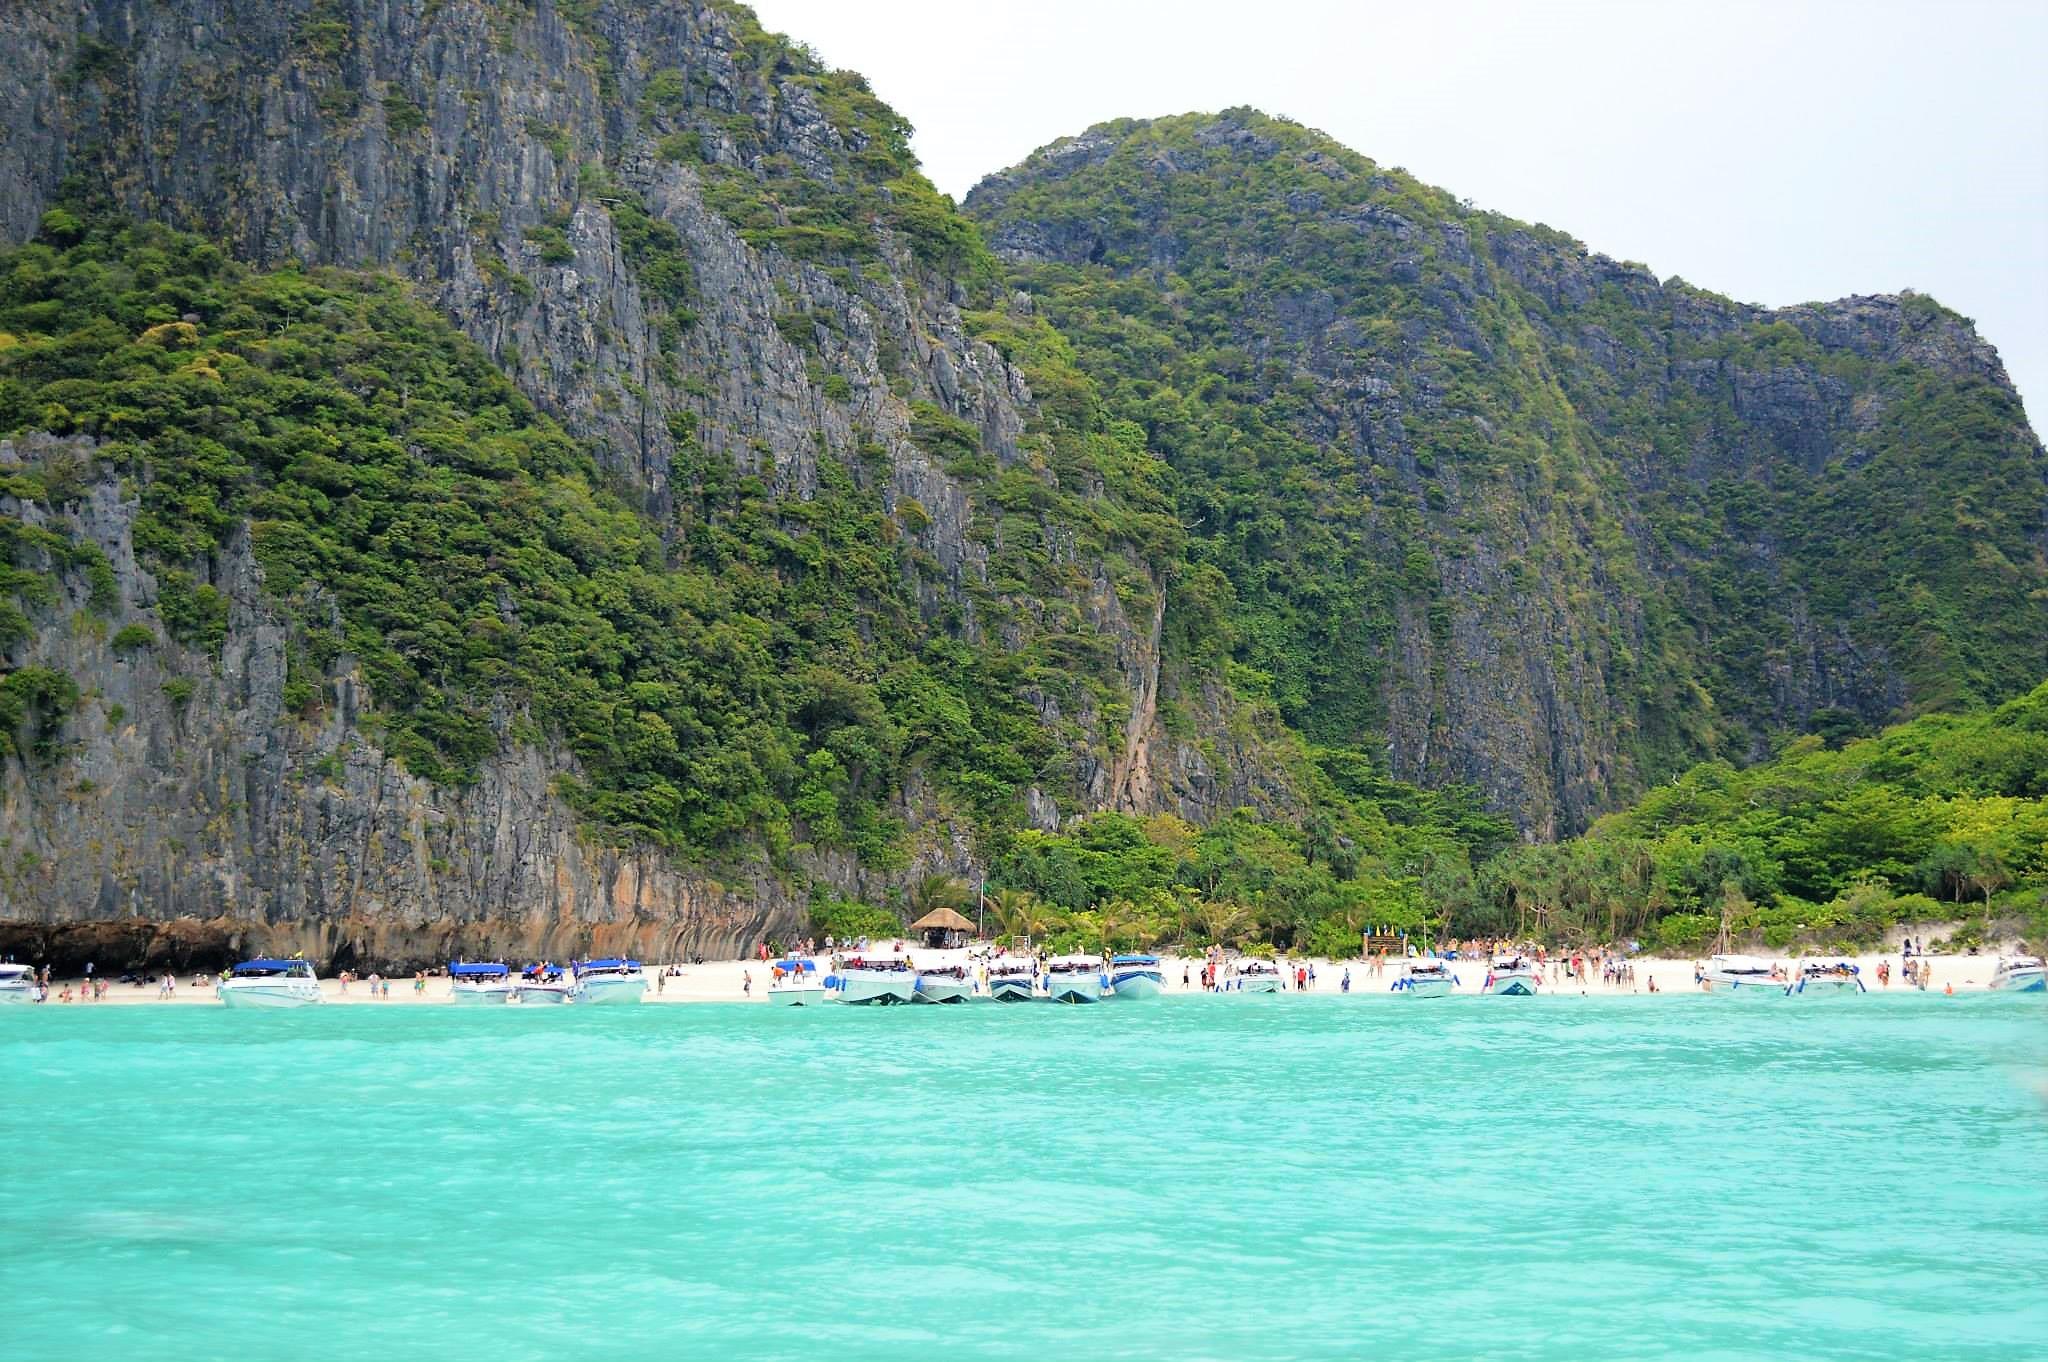 Maya Bay, Ko Phi Phi Don island, Thailand